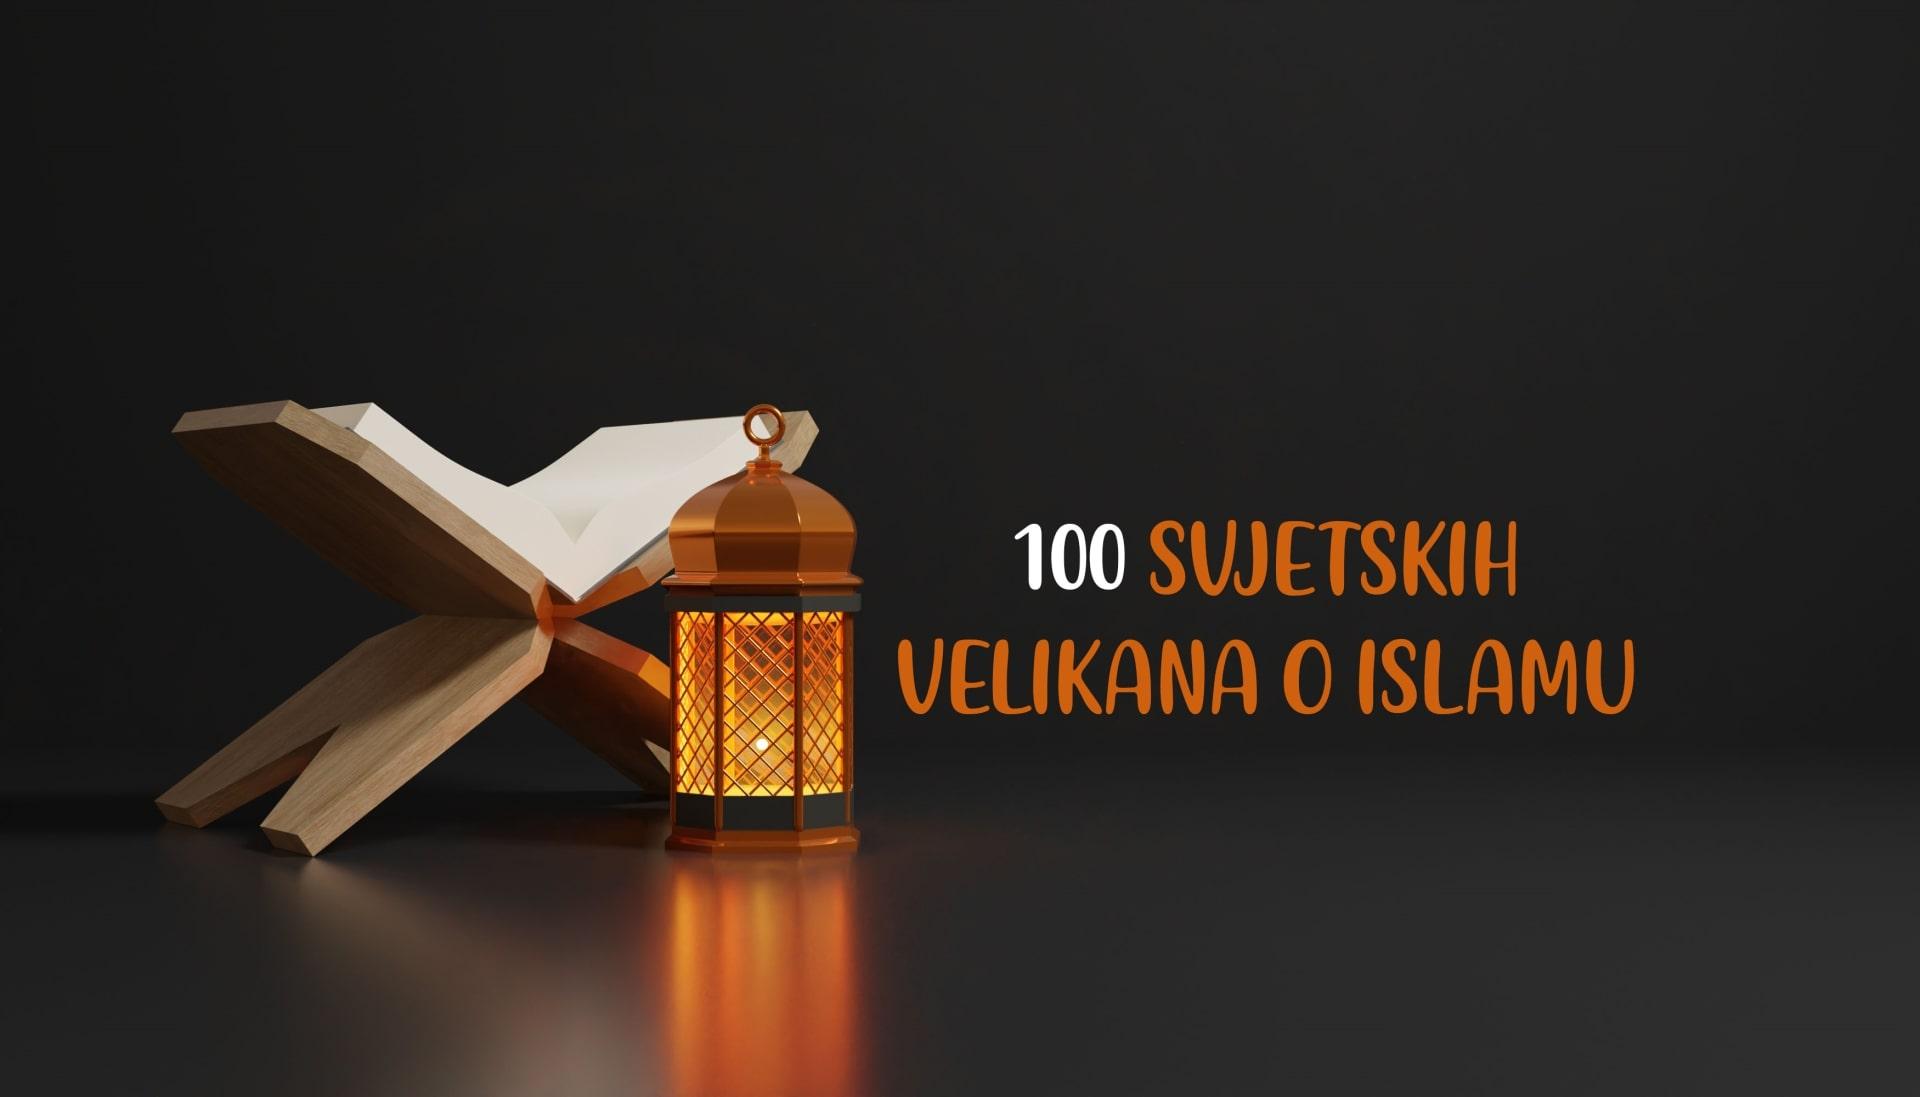 100 svjetskih velikana o islamu – Džon Henri Haren Poučne priče El-Kelimeh Islamska literatura Islamske knjige